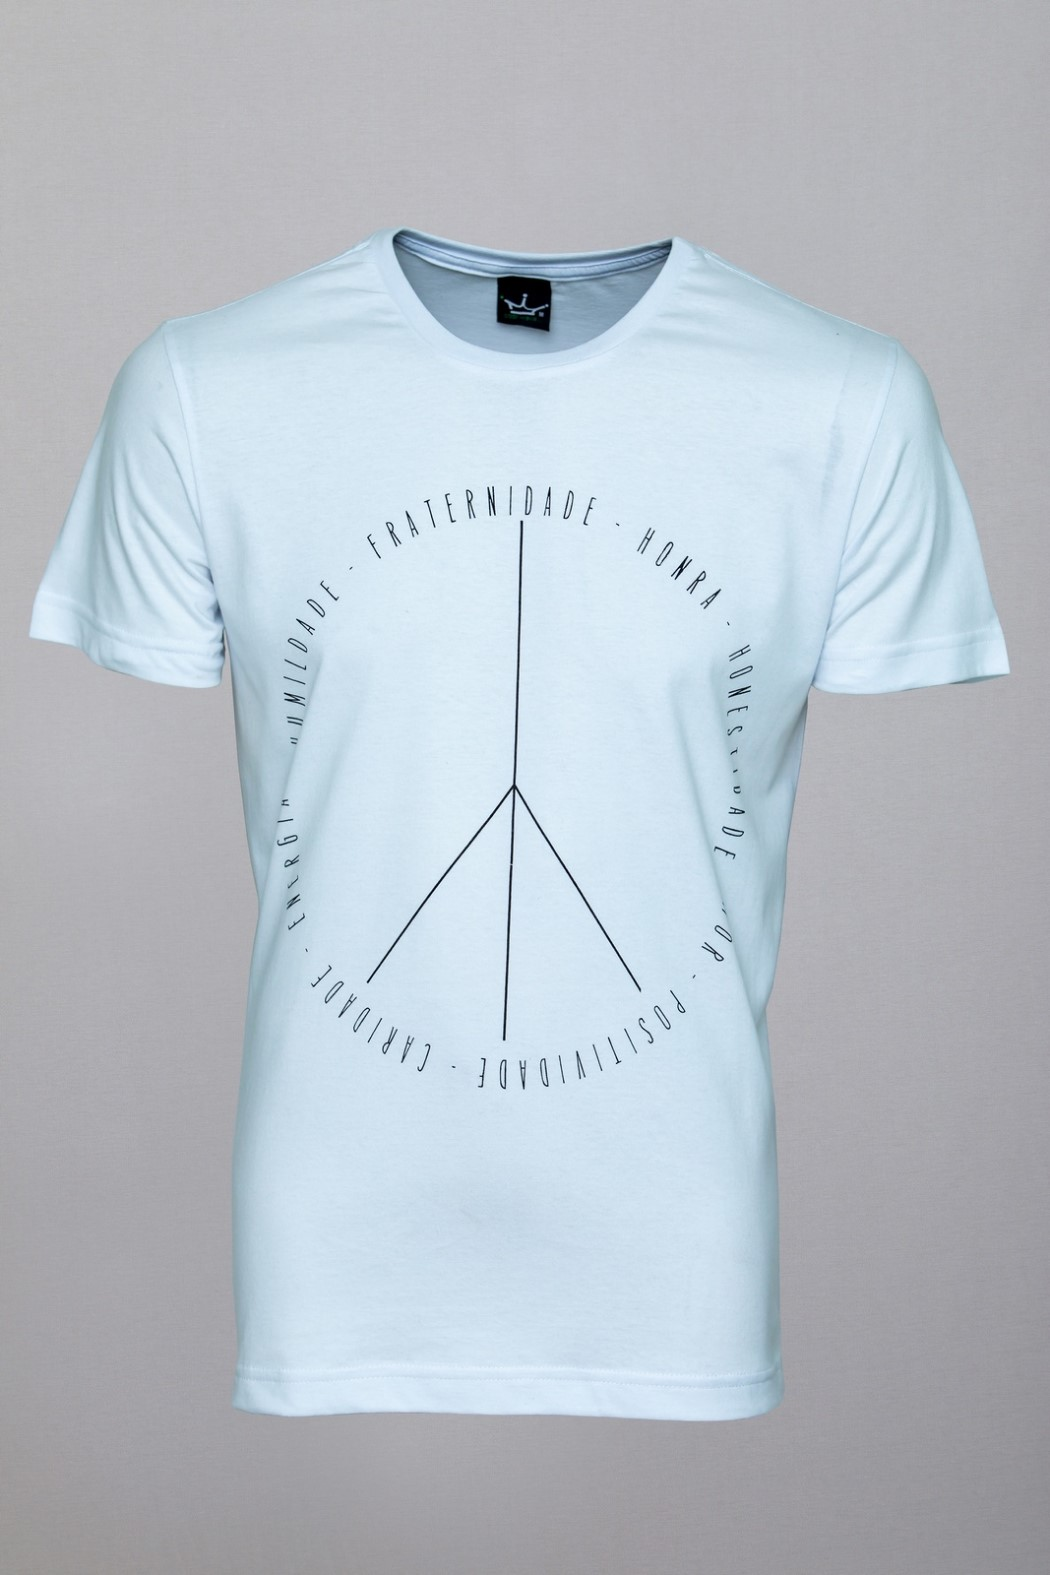 Camiseta CoolWave Principles